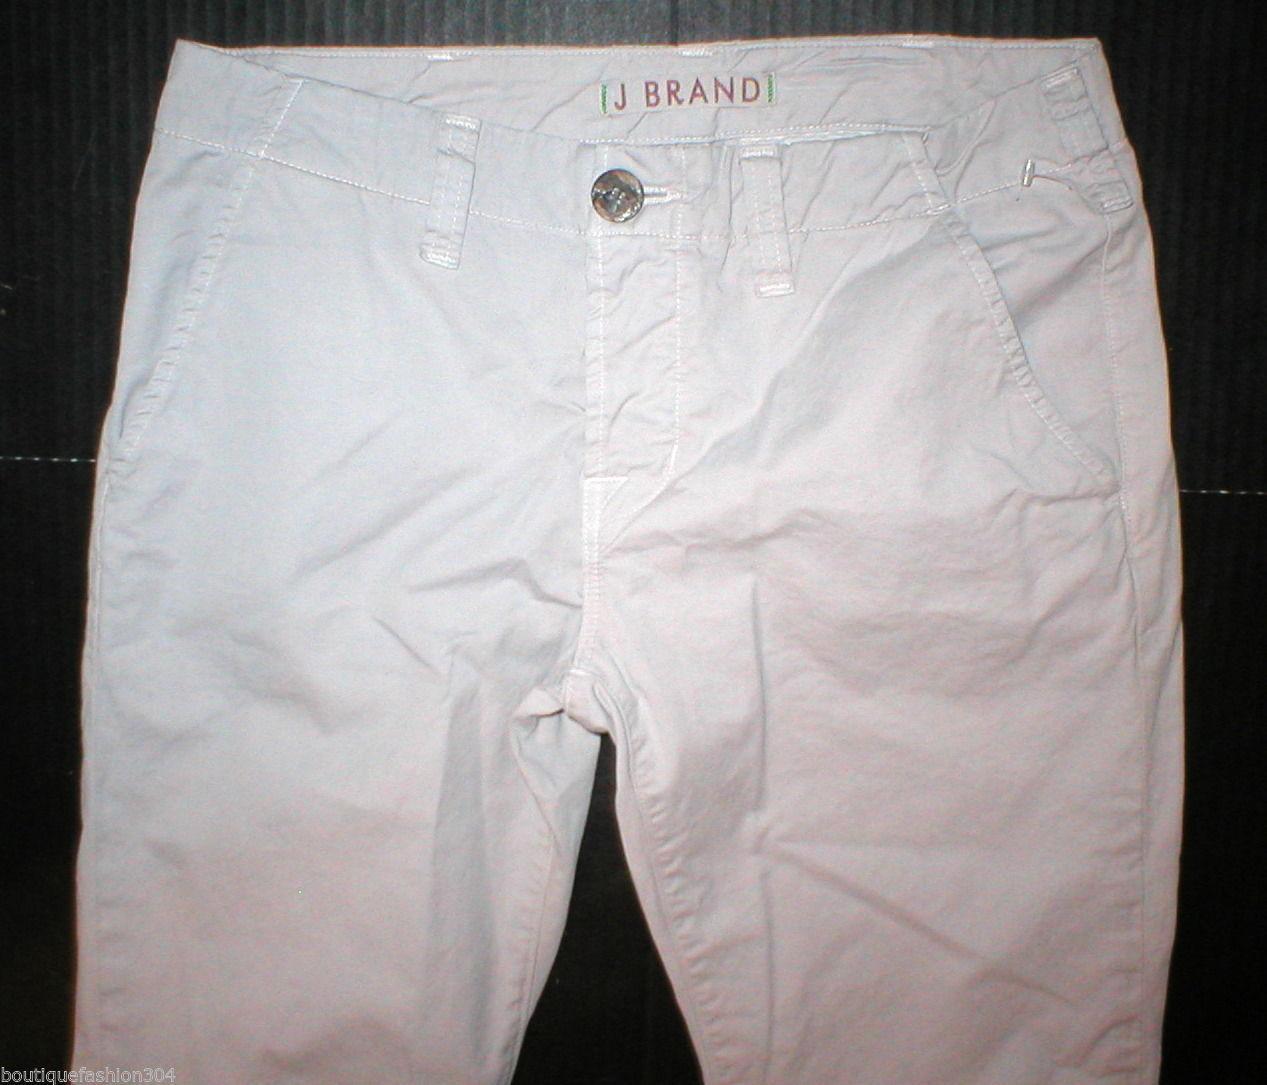 New J Brand Jeans Pants Khaki 25 28 X 27 Crop Womens Skinny Capri Khakis Twill image 2